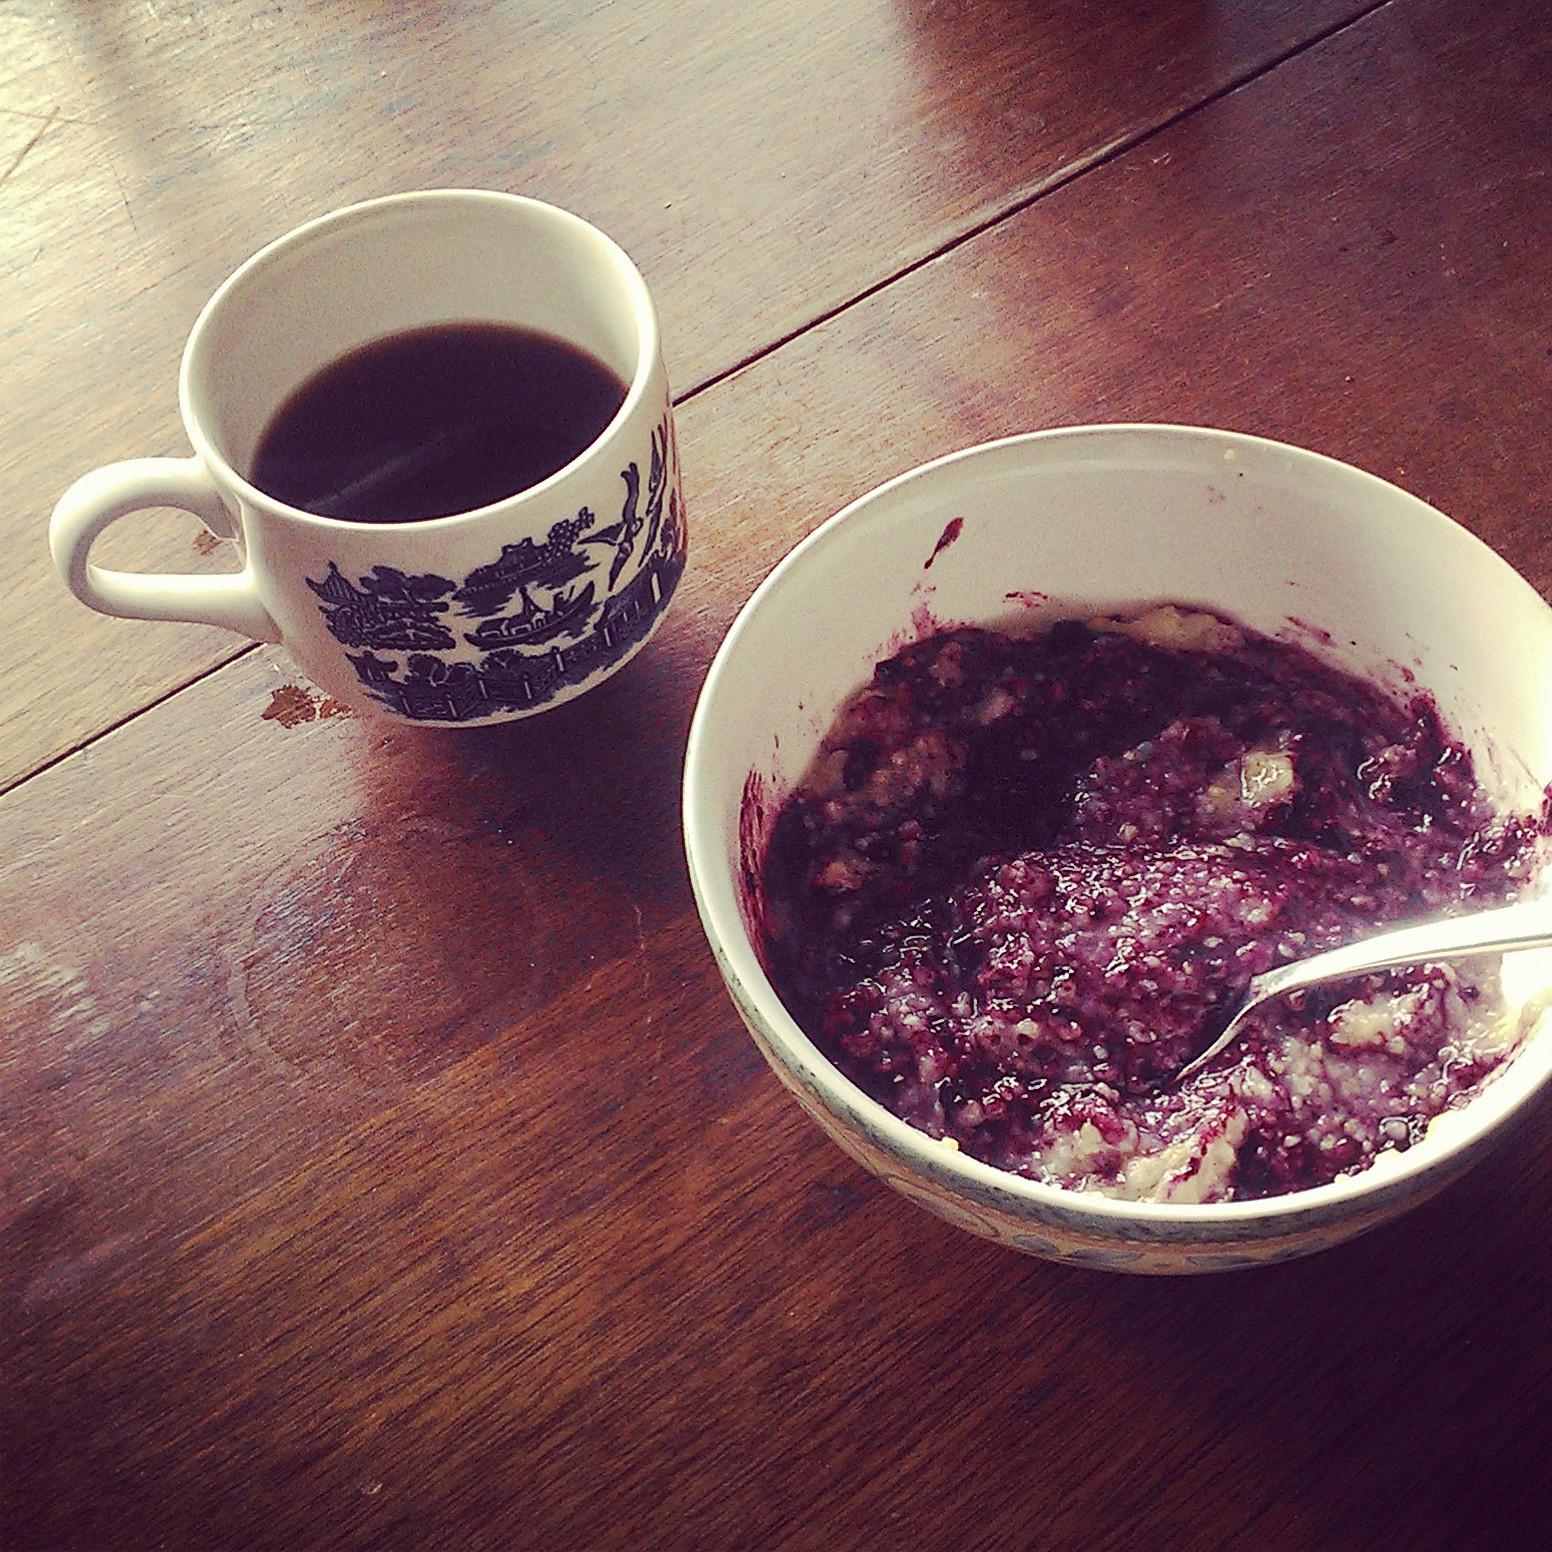 Coffee and blueberry breakfast porridge